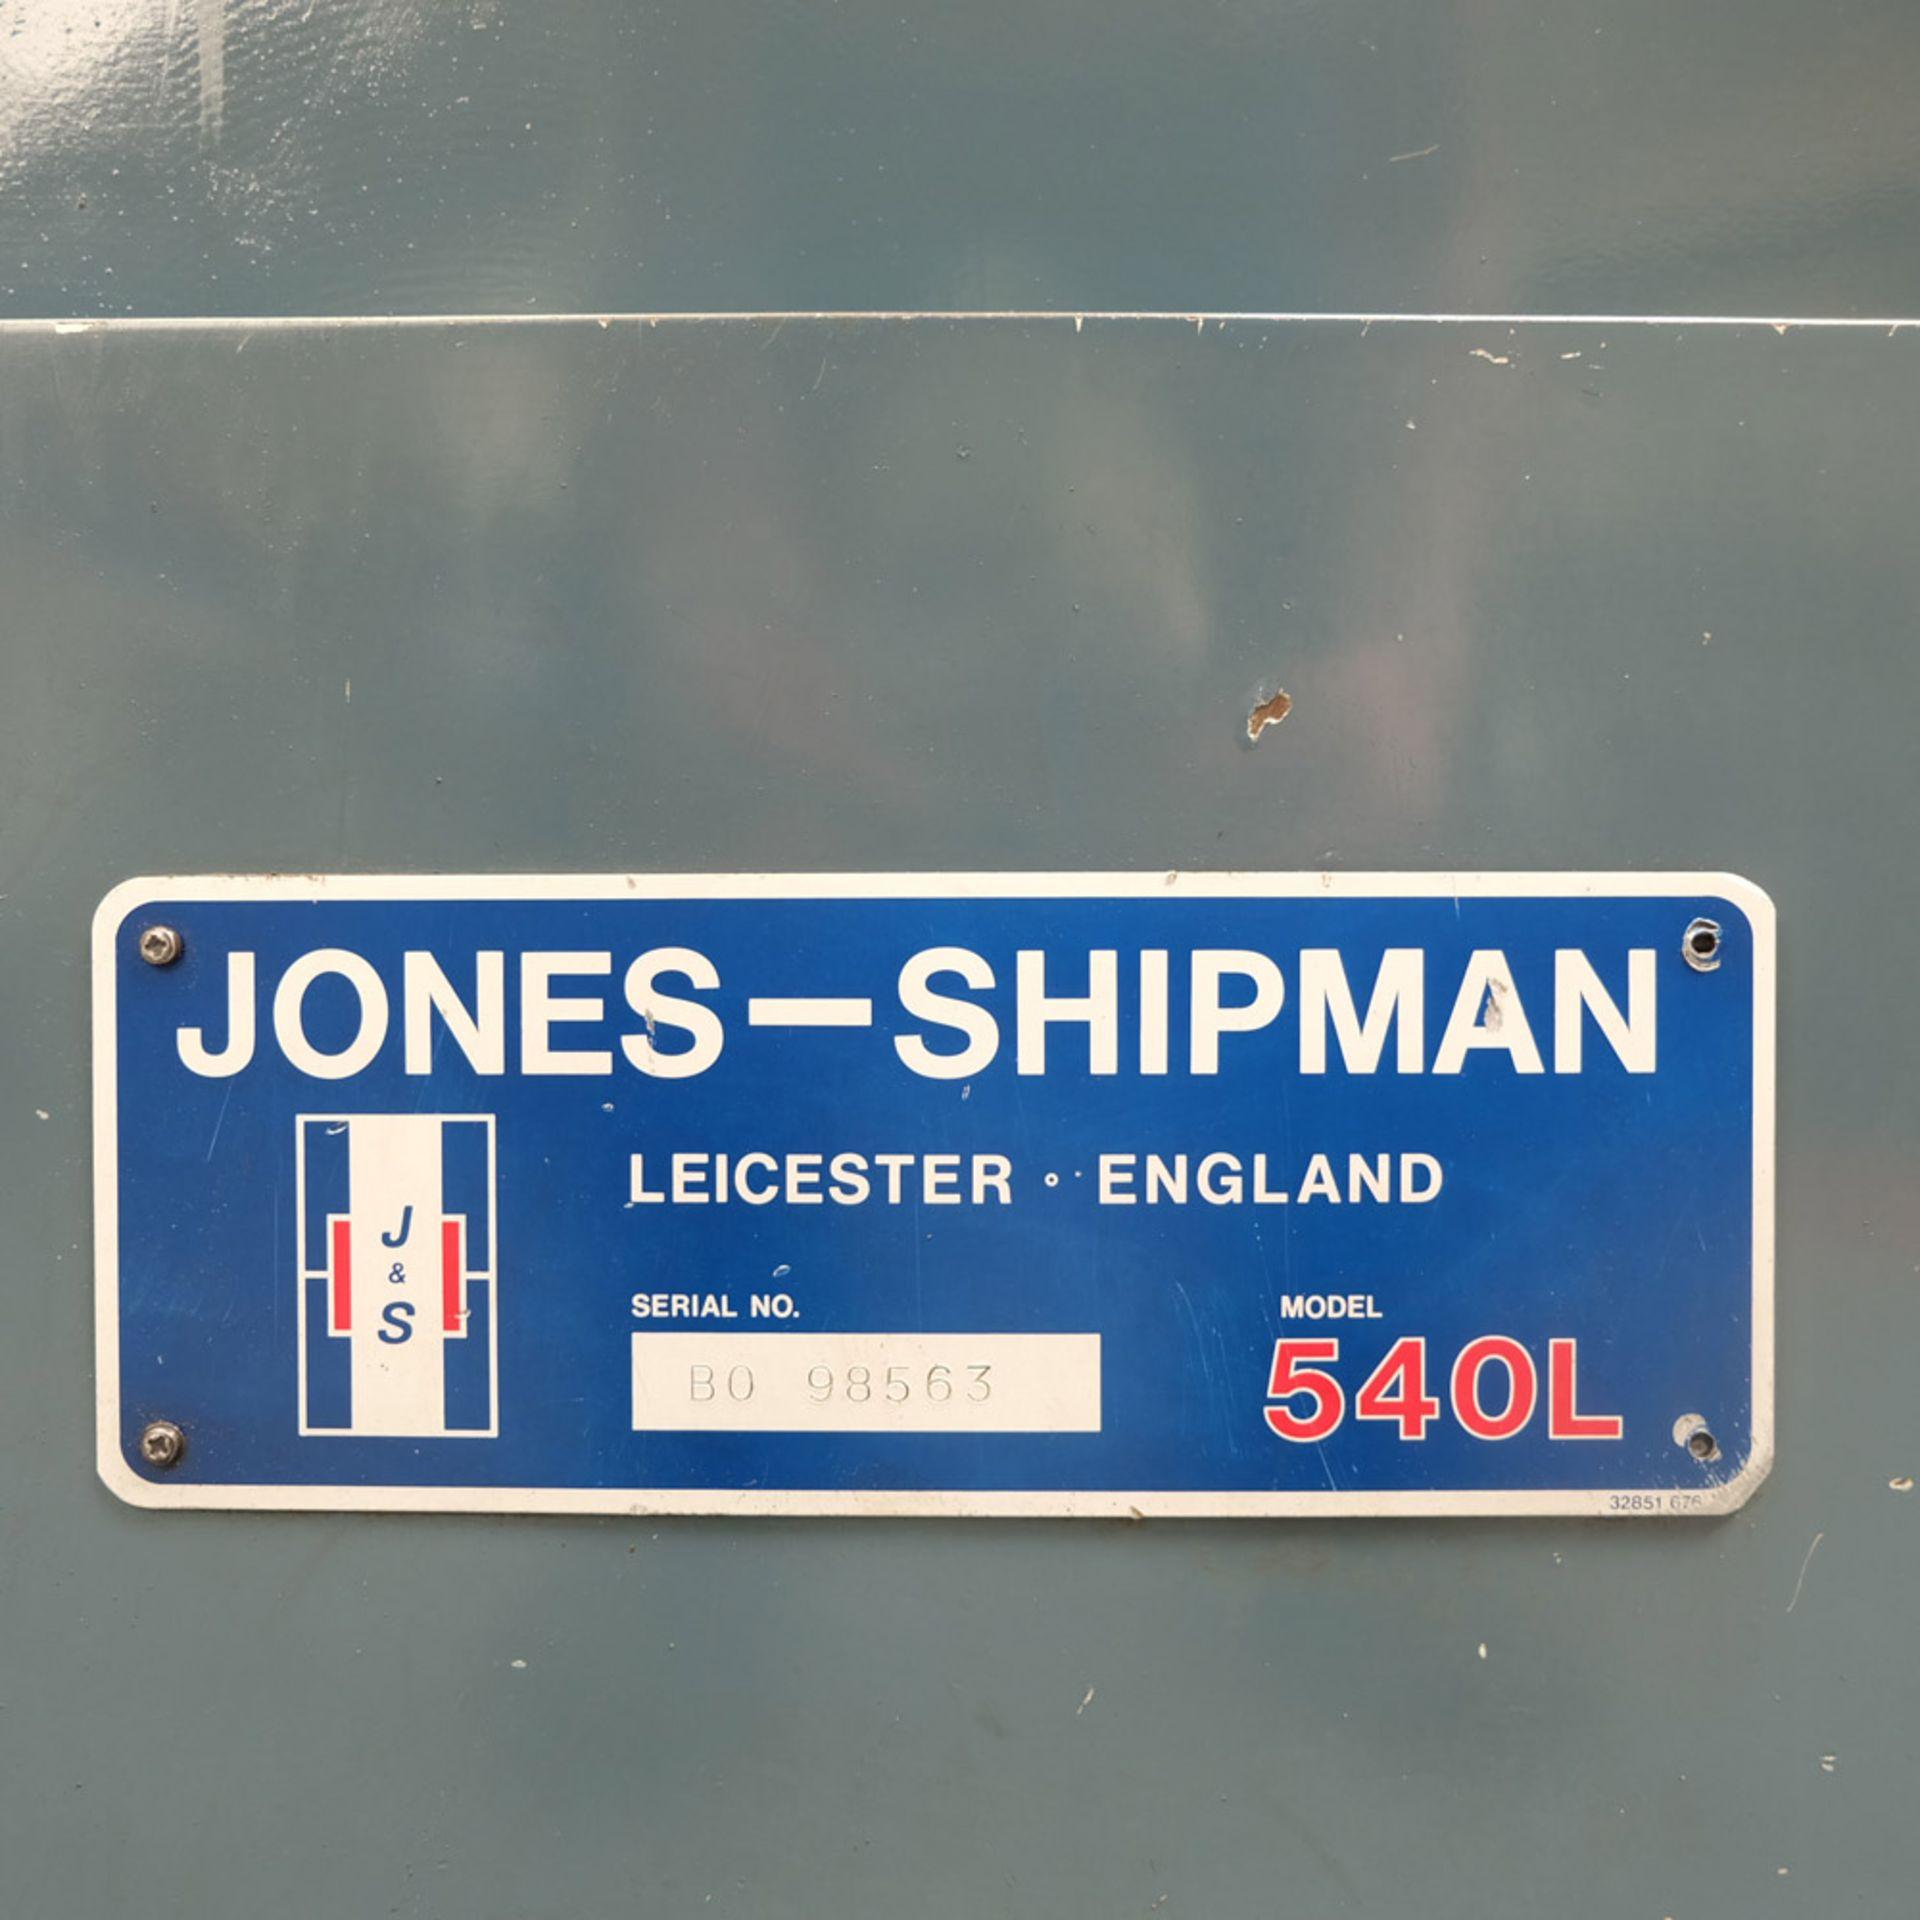 "Jones & Shipman 540L Tool Room Surface Grinder. Capacity 18"" x 6"". - Image 6 of 6"